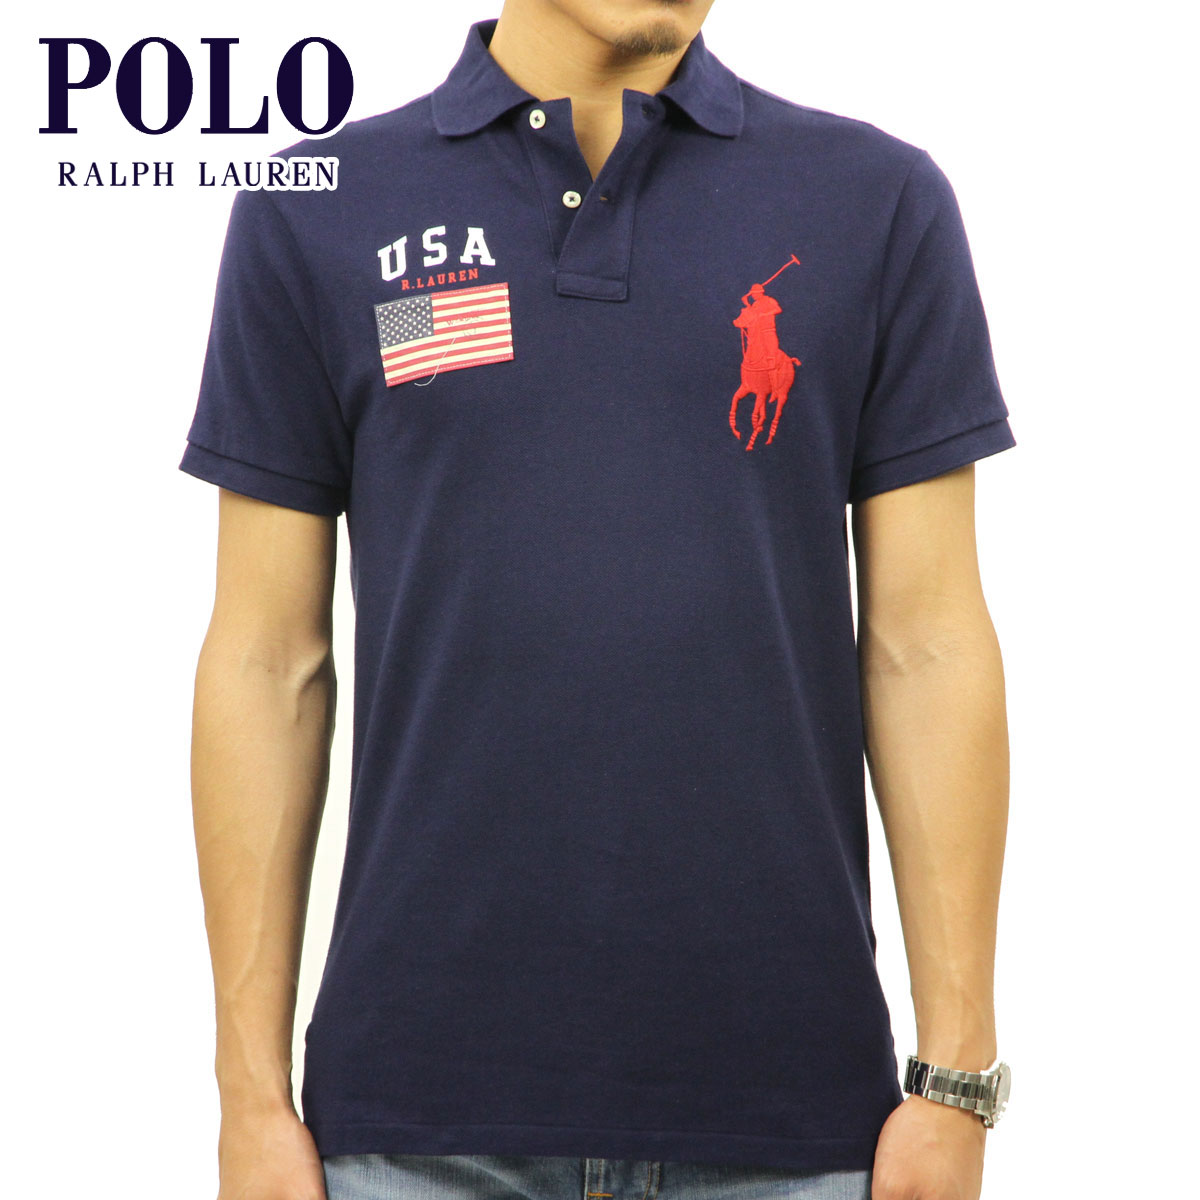 44262c09 Polo Ralph Lauren POLO RALPH LAUREN regular article men short sleeves polo  shirt CUSTOM-FIT ...